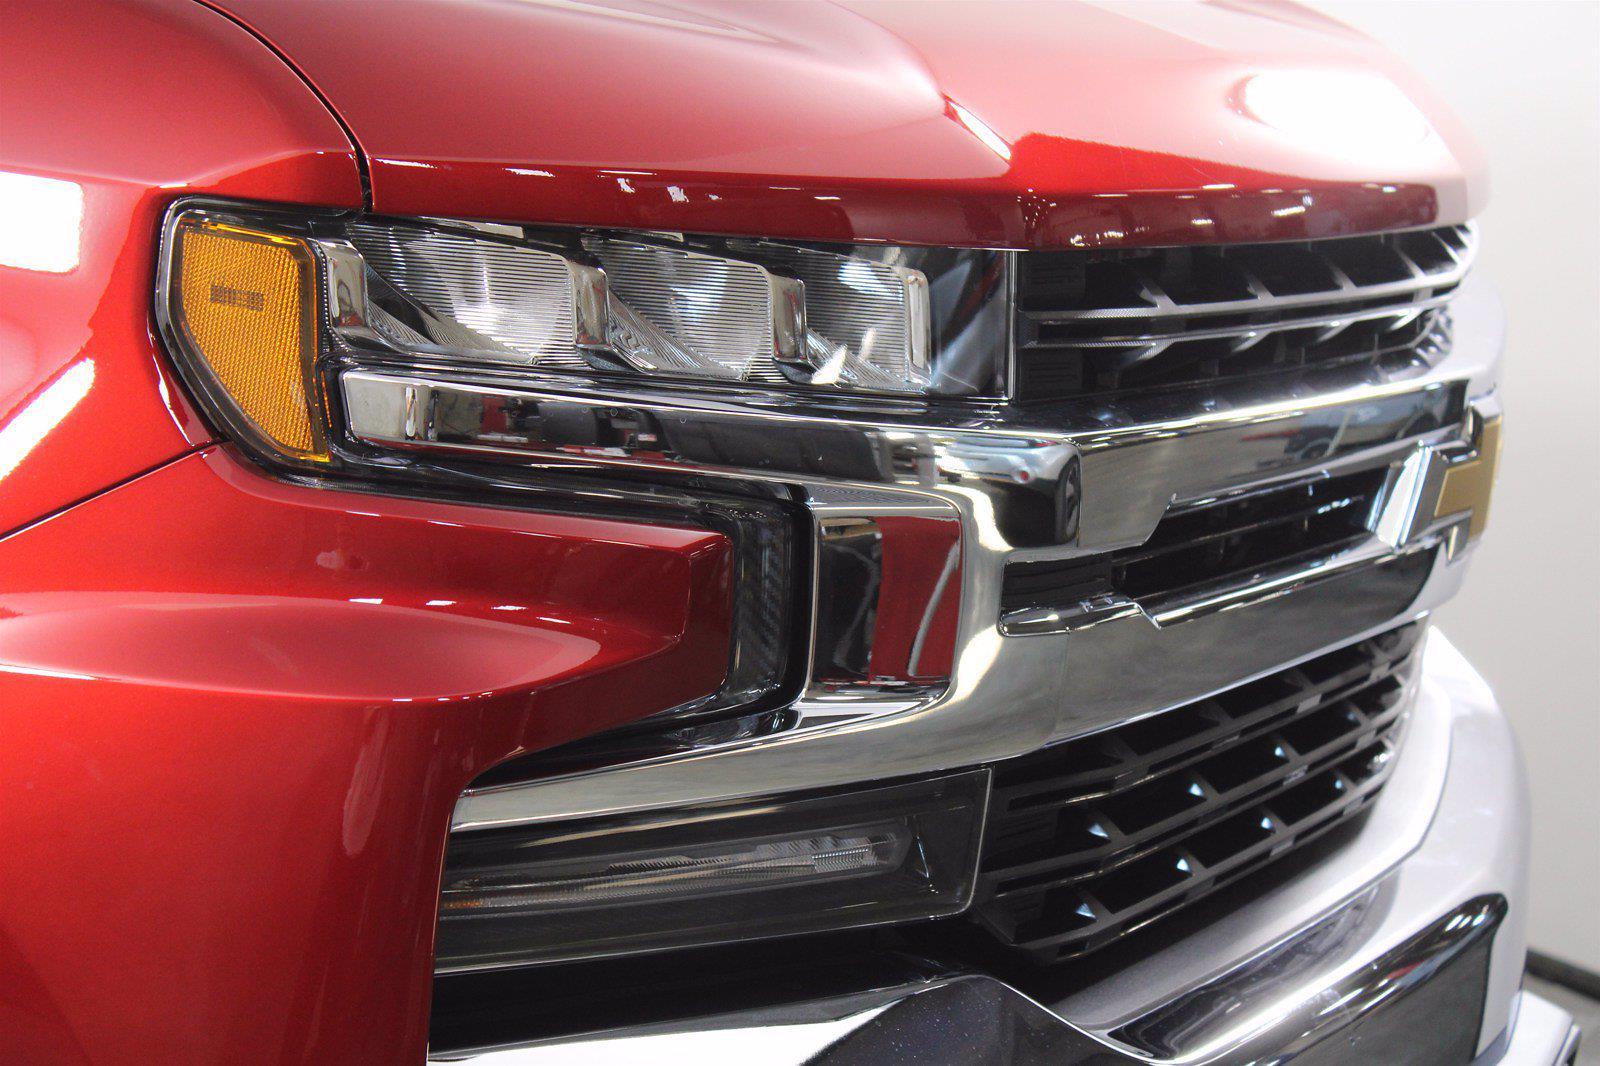 2021 Chevrolet Silverado 1500 Crew Cab 4x4, Pickup #D111130 - photo 5